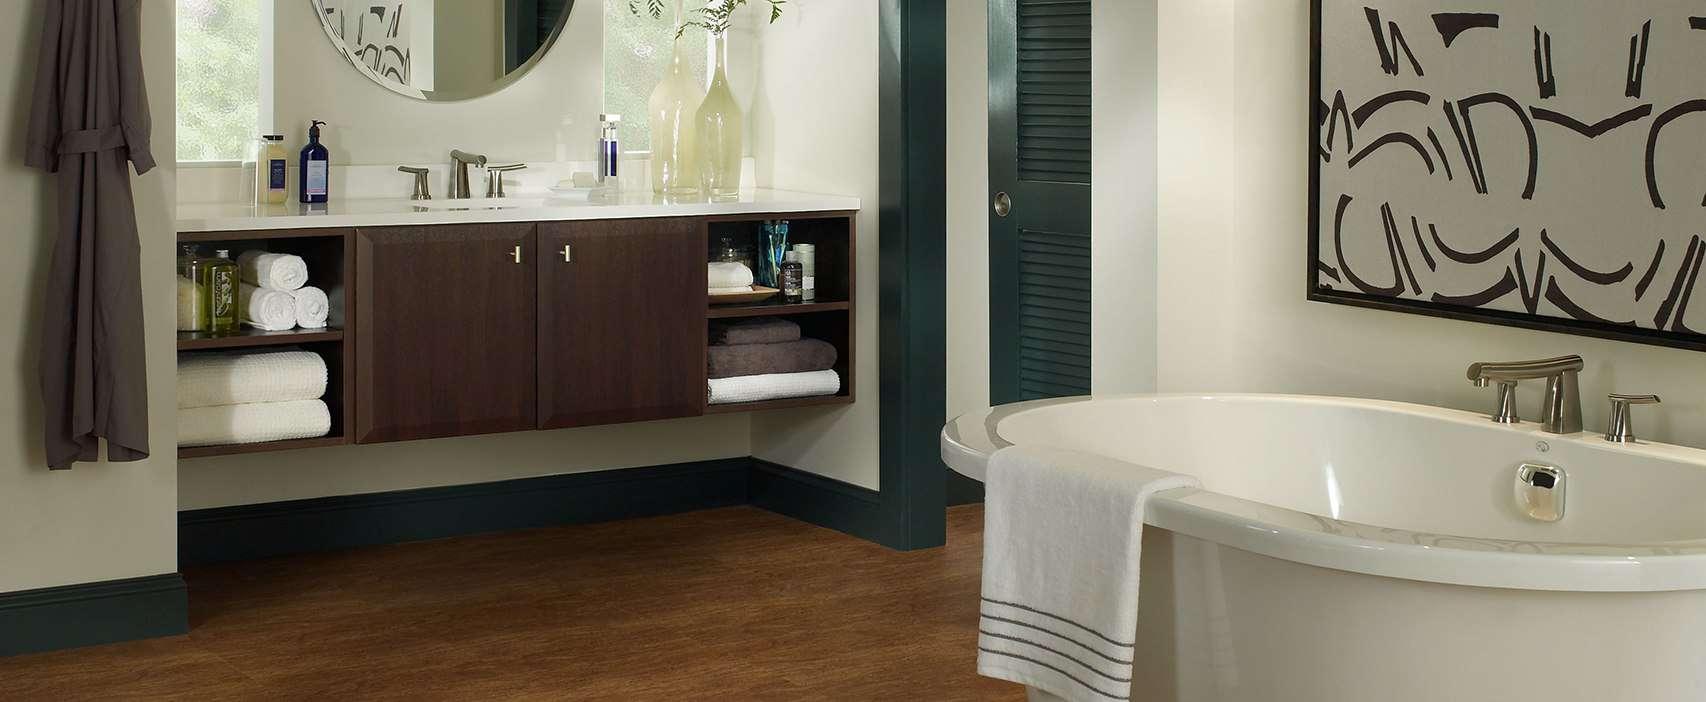 better bath cabinets by bertch. Black Bedroom Furniture Sets. Home Design Ideas